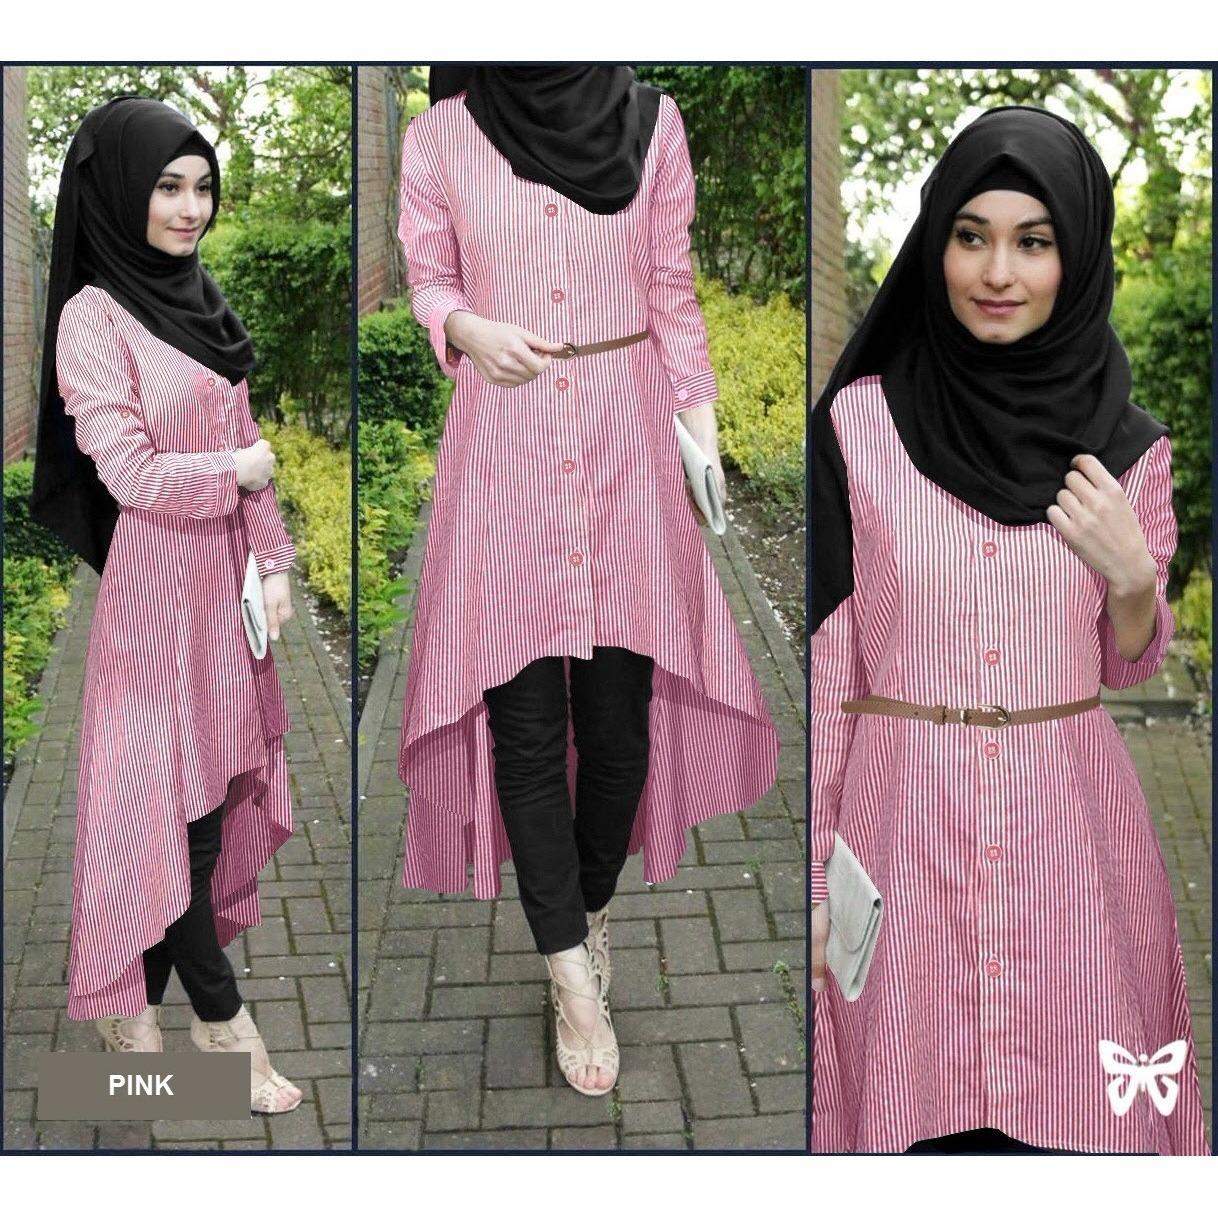 Diskon Produk Flavia Store Baju Muslim Wanita Set 4 In 1 Salur Fs0693 Pink Setelan Muslimah Stelan Gamis Hijab Atasan Blouse Terusan Kemeja Tunik Lengan Panjang Garis Bawahan Celana Srsafirasalur